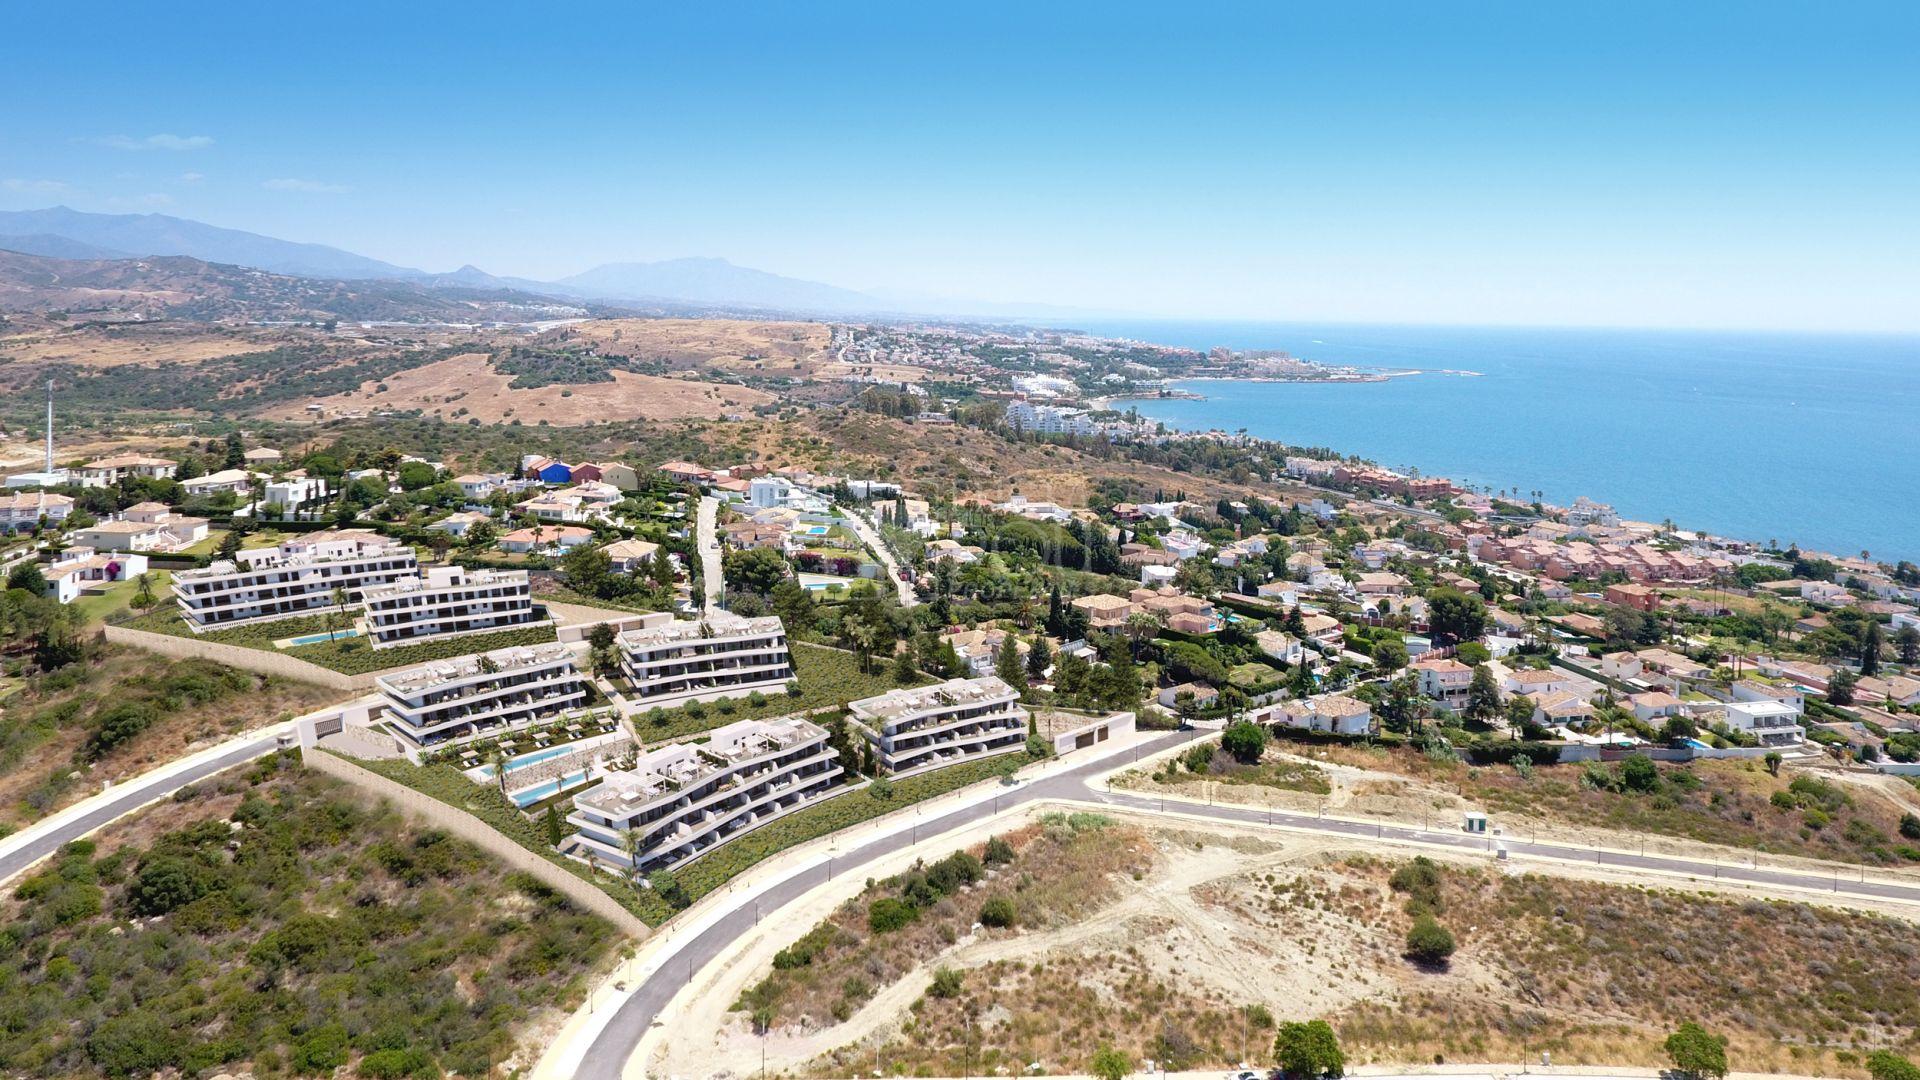 Development in Estepona